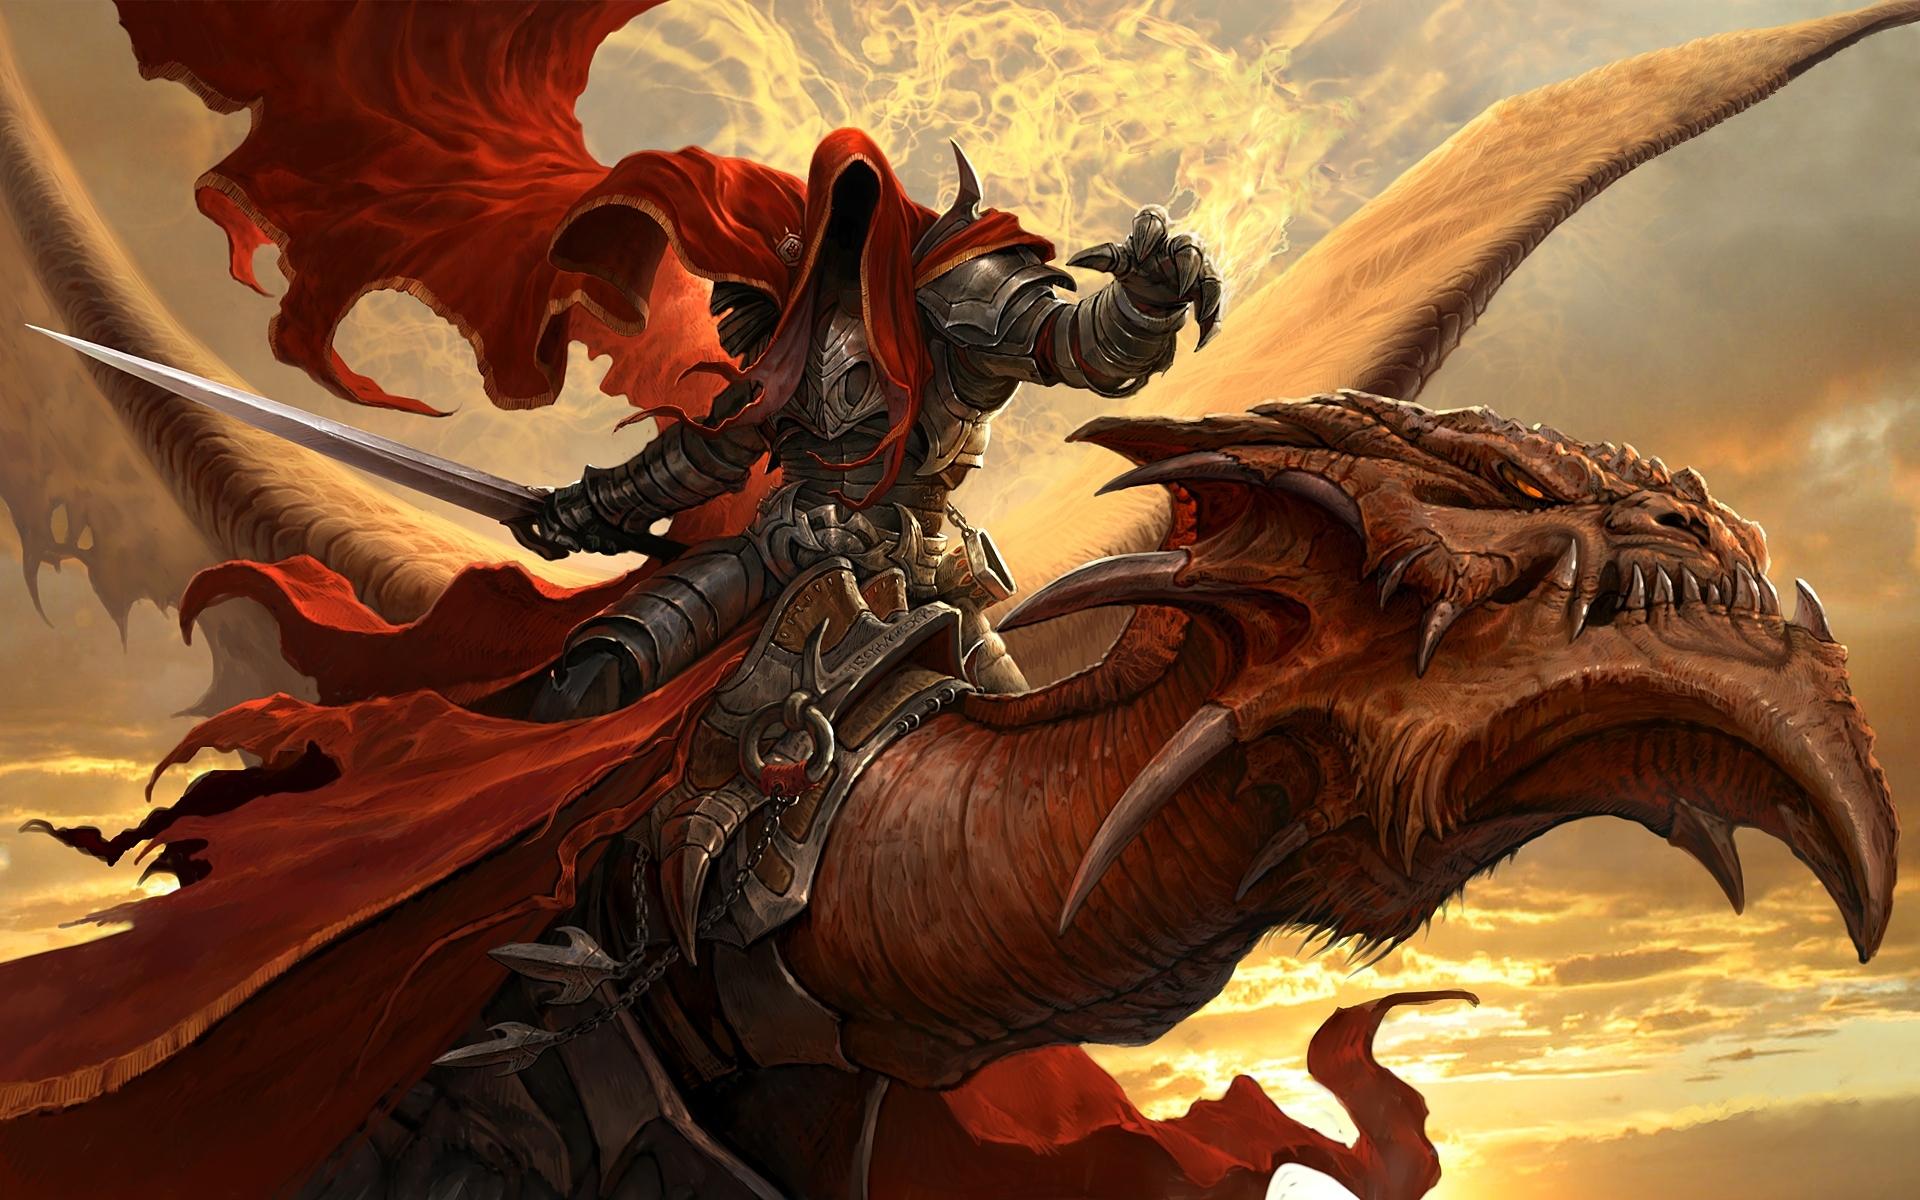 Fierce Dragon Rider HD Wallpapers